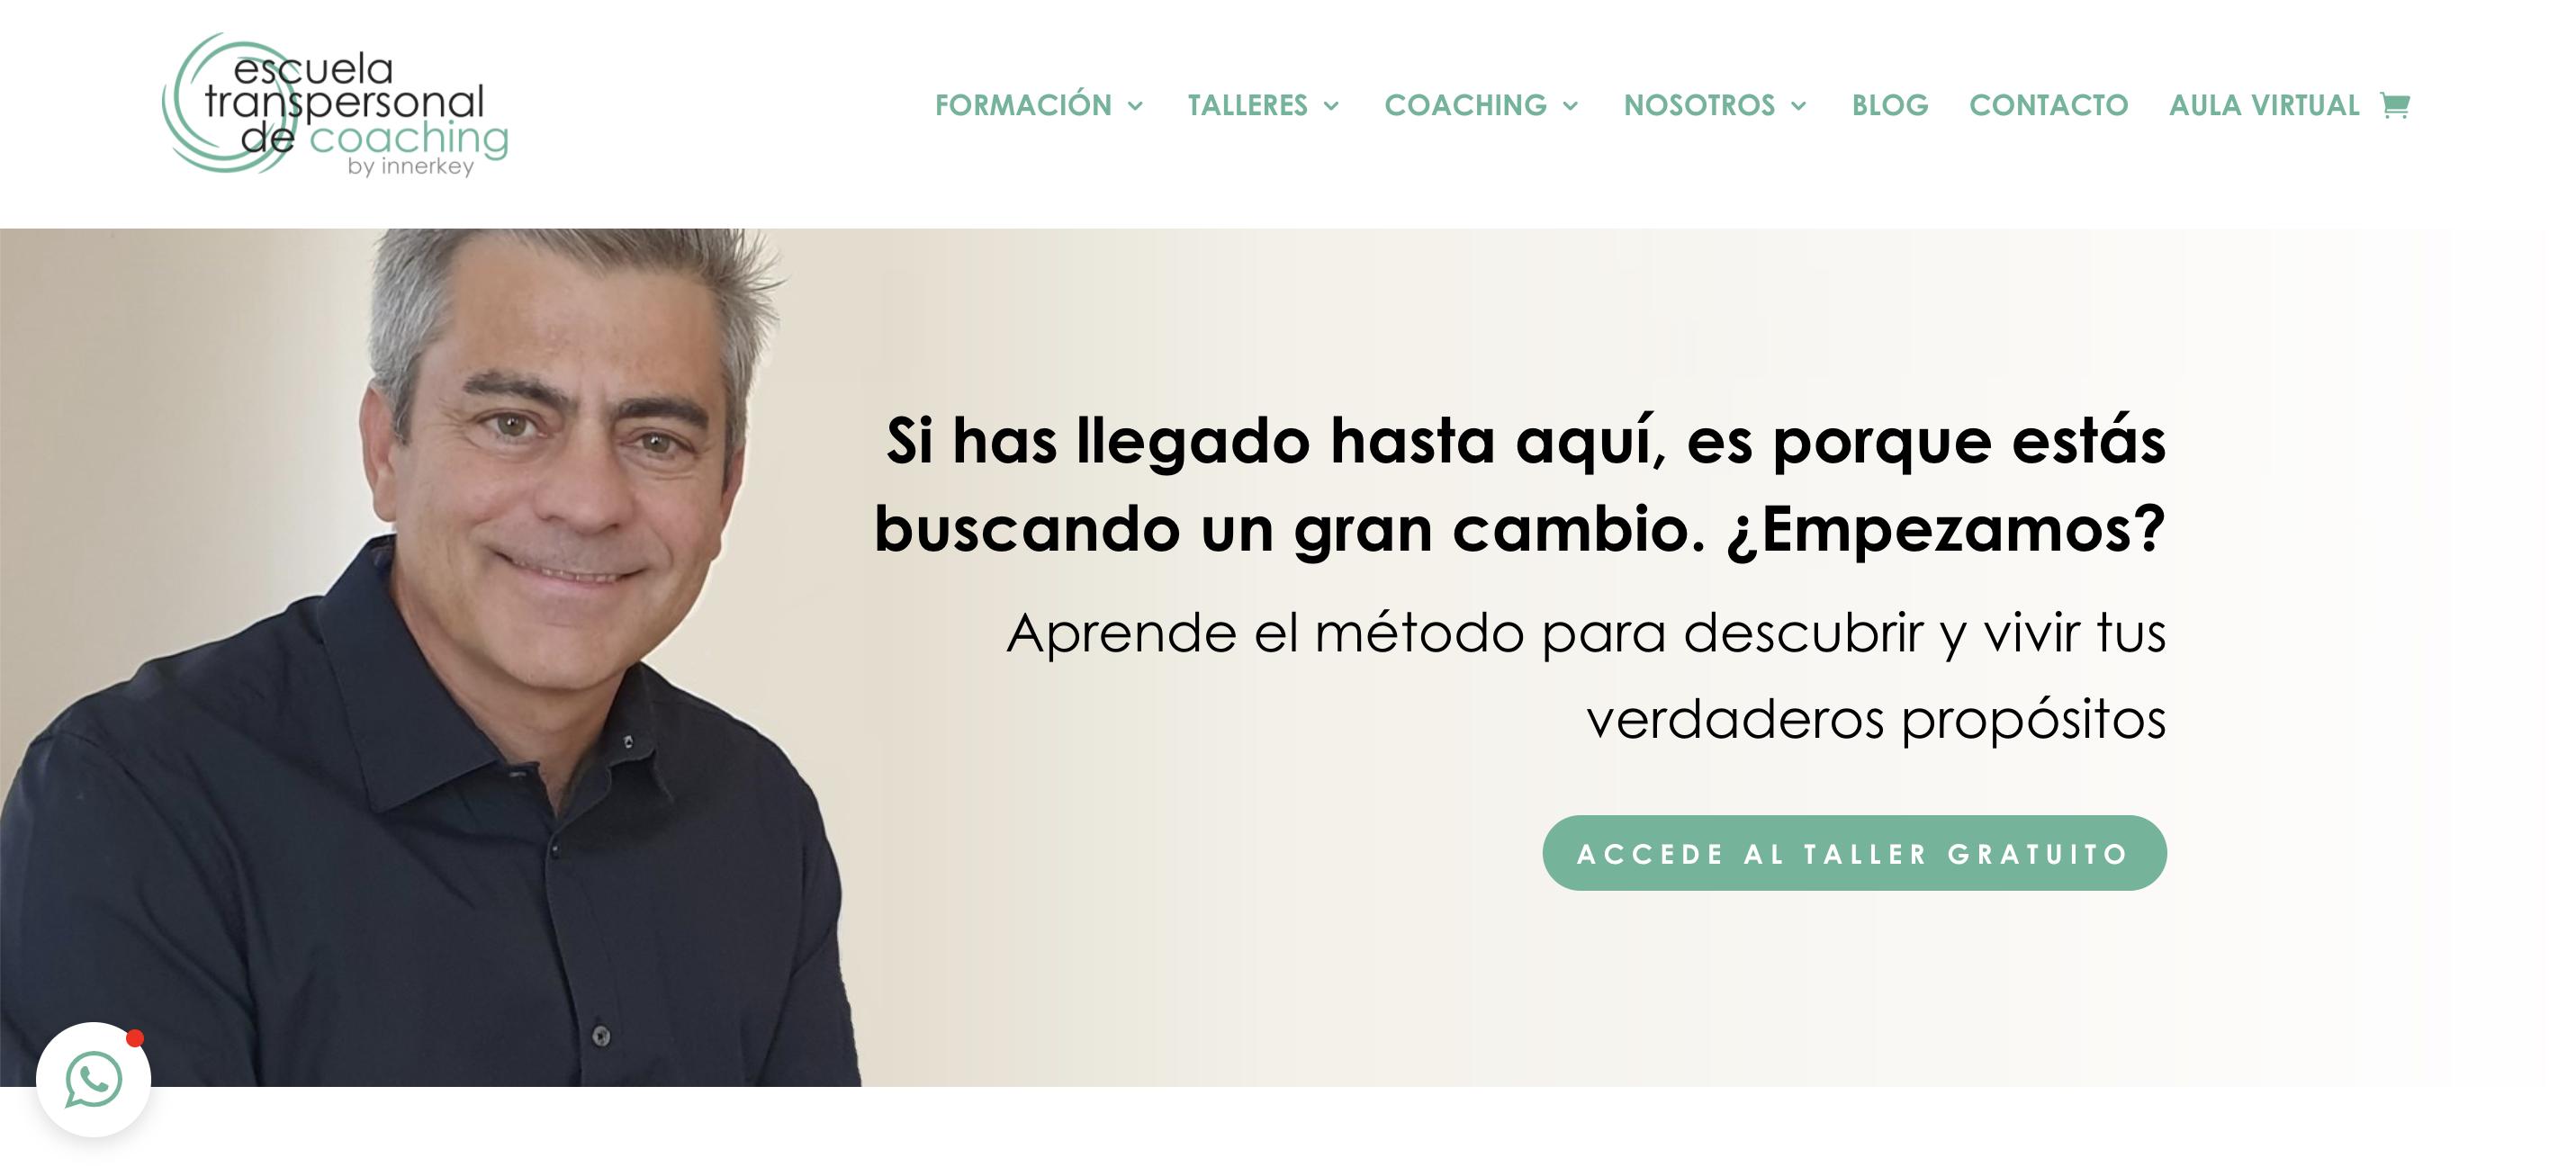 inner-key.com coaching diseño web mooiwebdesign.com